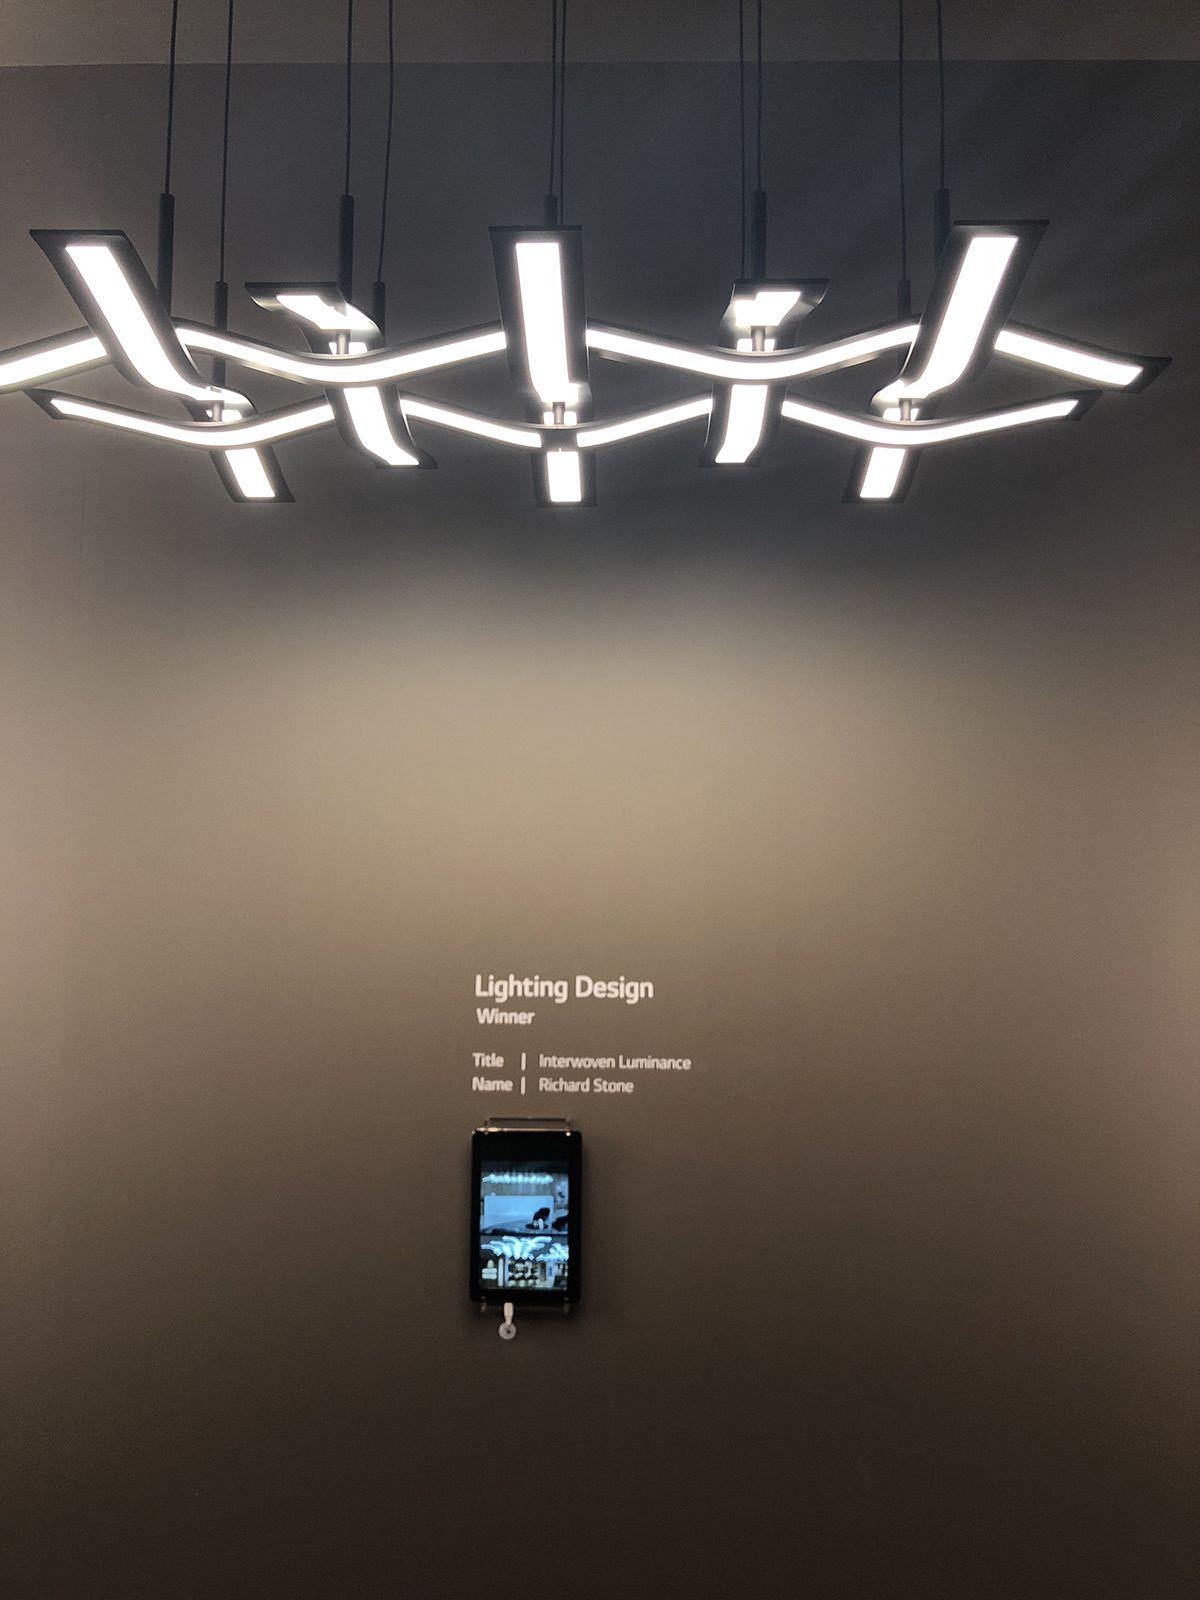 Luflex Lg Oled Lights